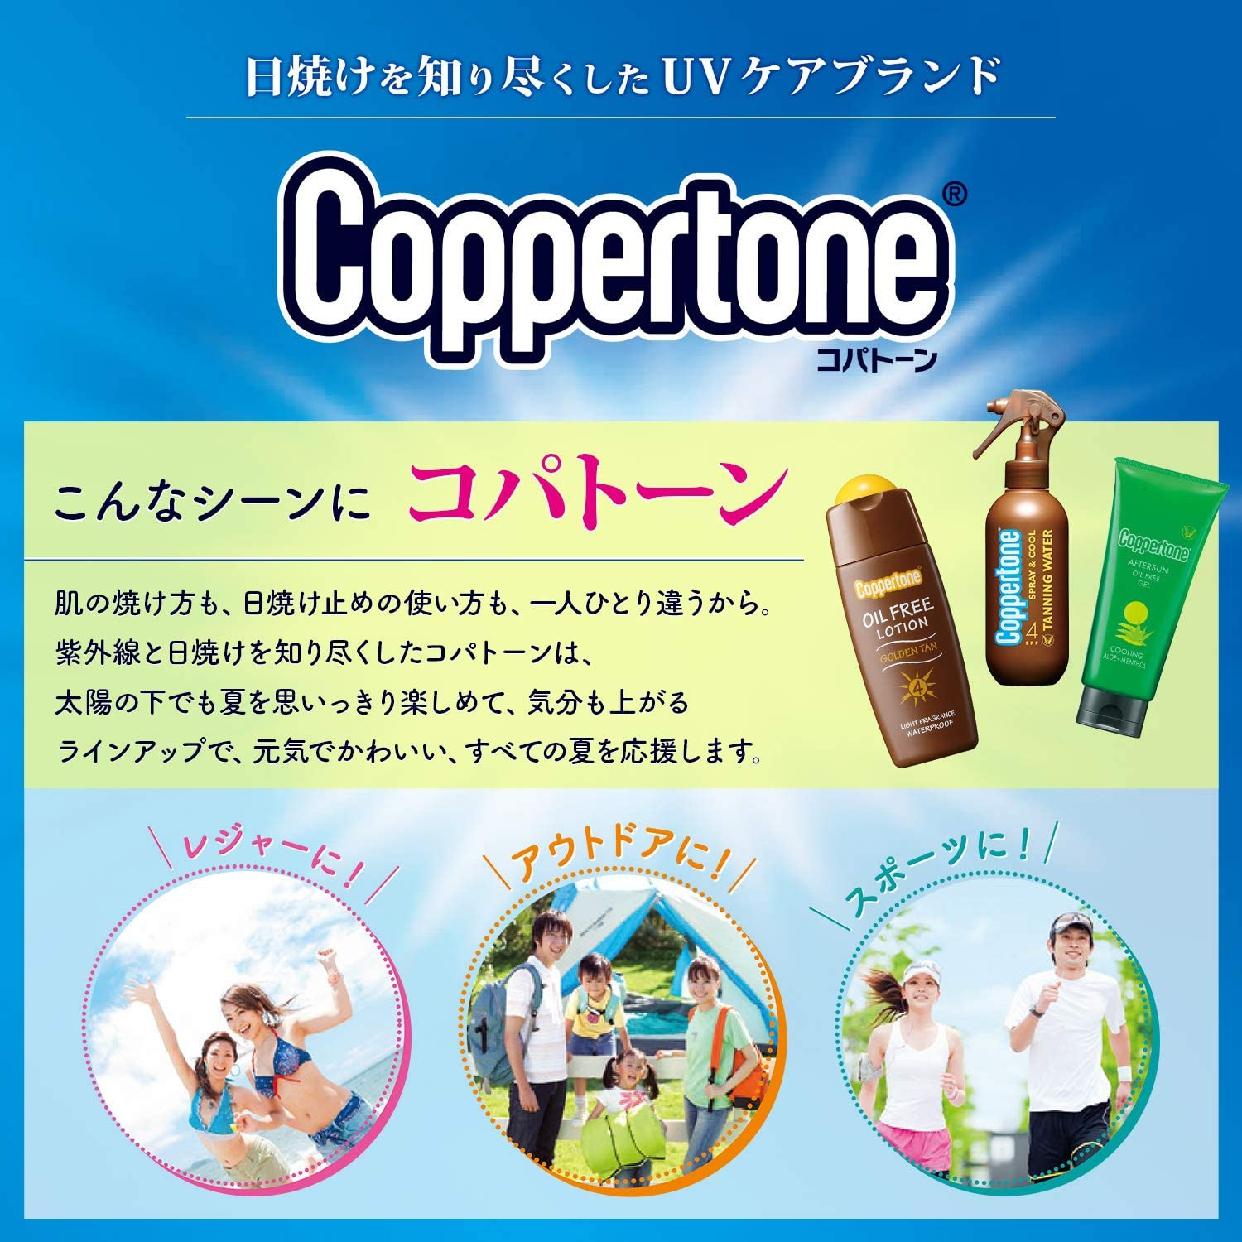 Coppertone(コパトーン)コパトーン ゴールデン タン オイルフリー ローションの商品画像2